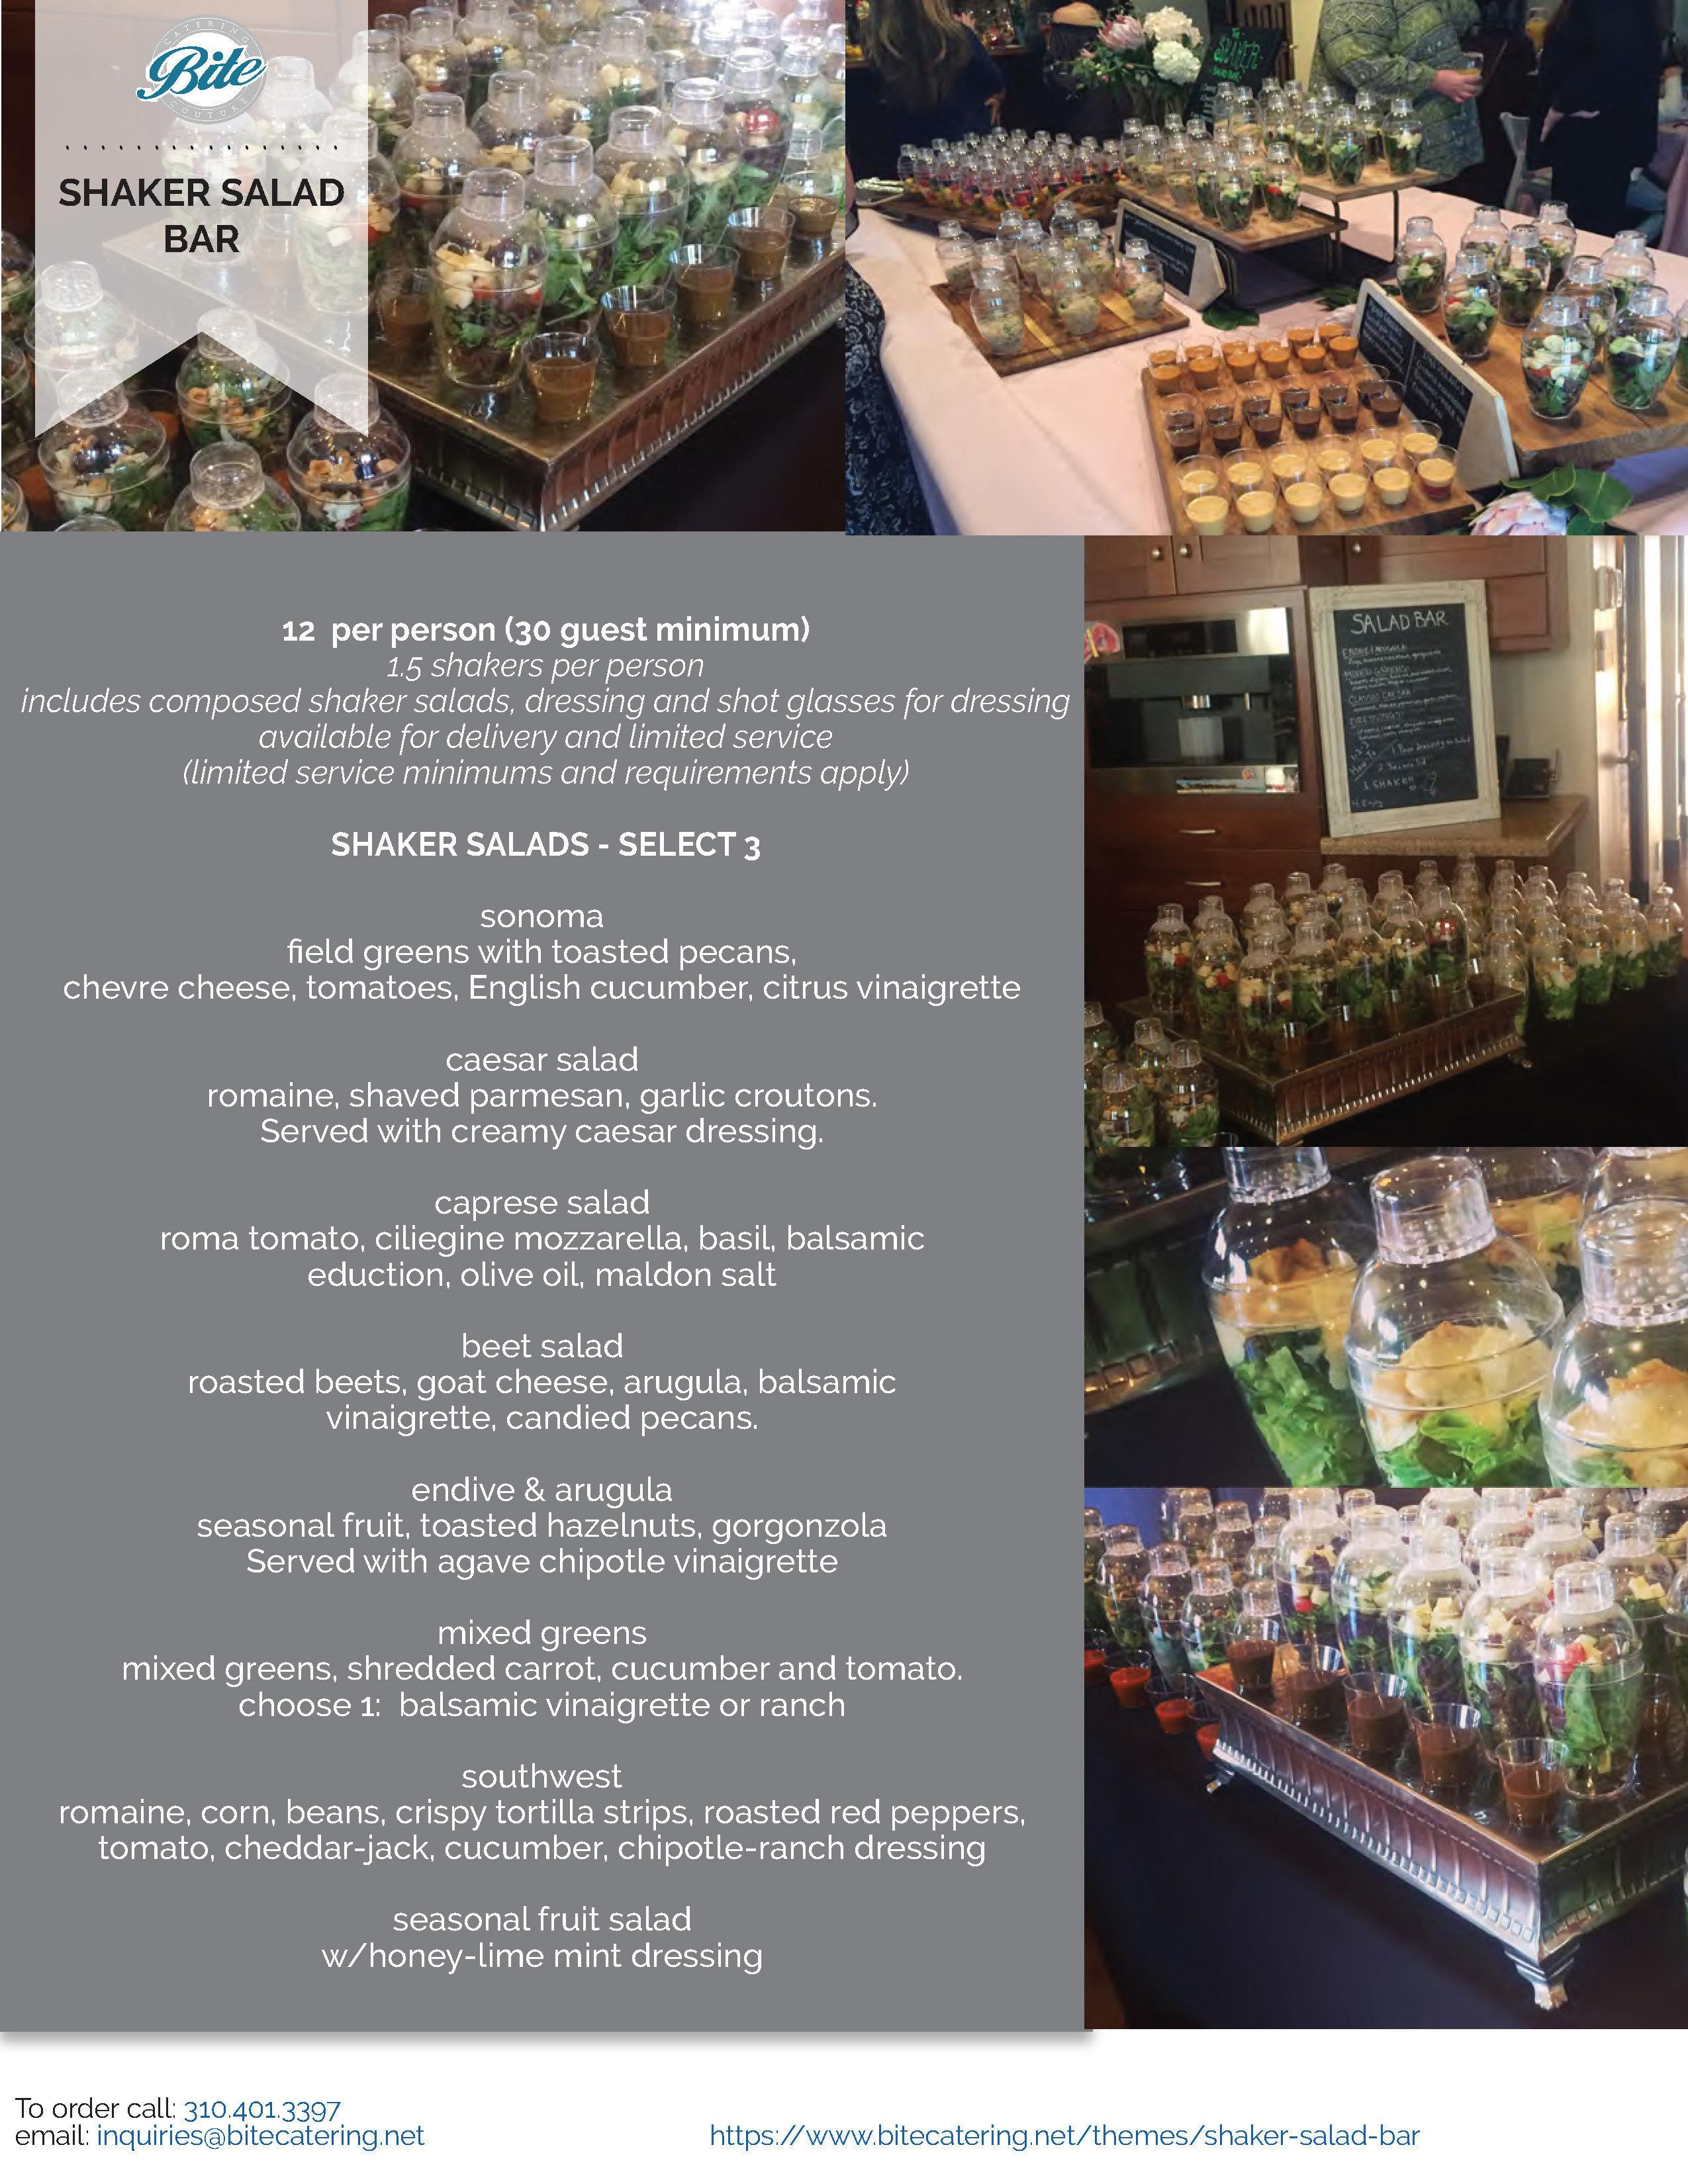 Shaker Salad Bar